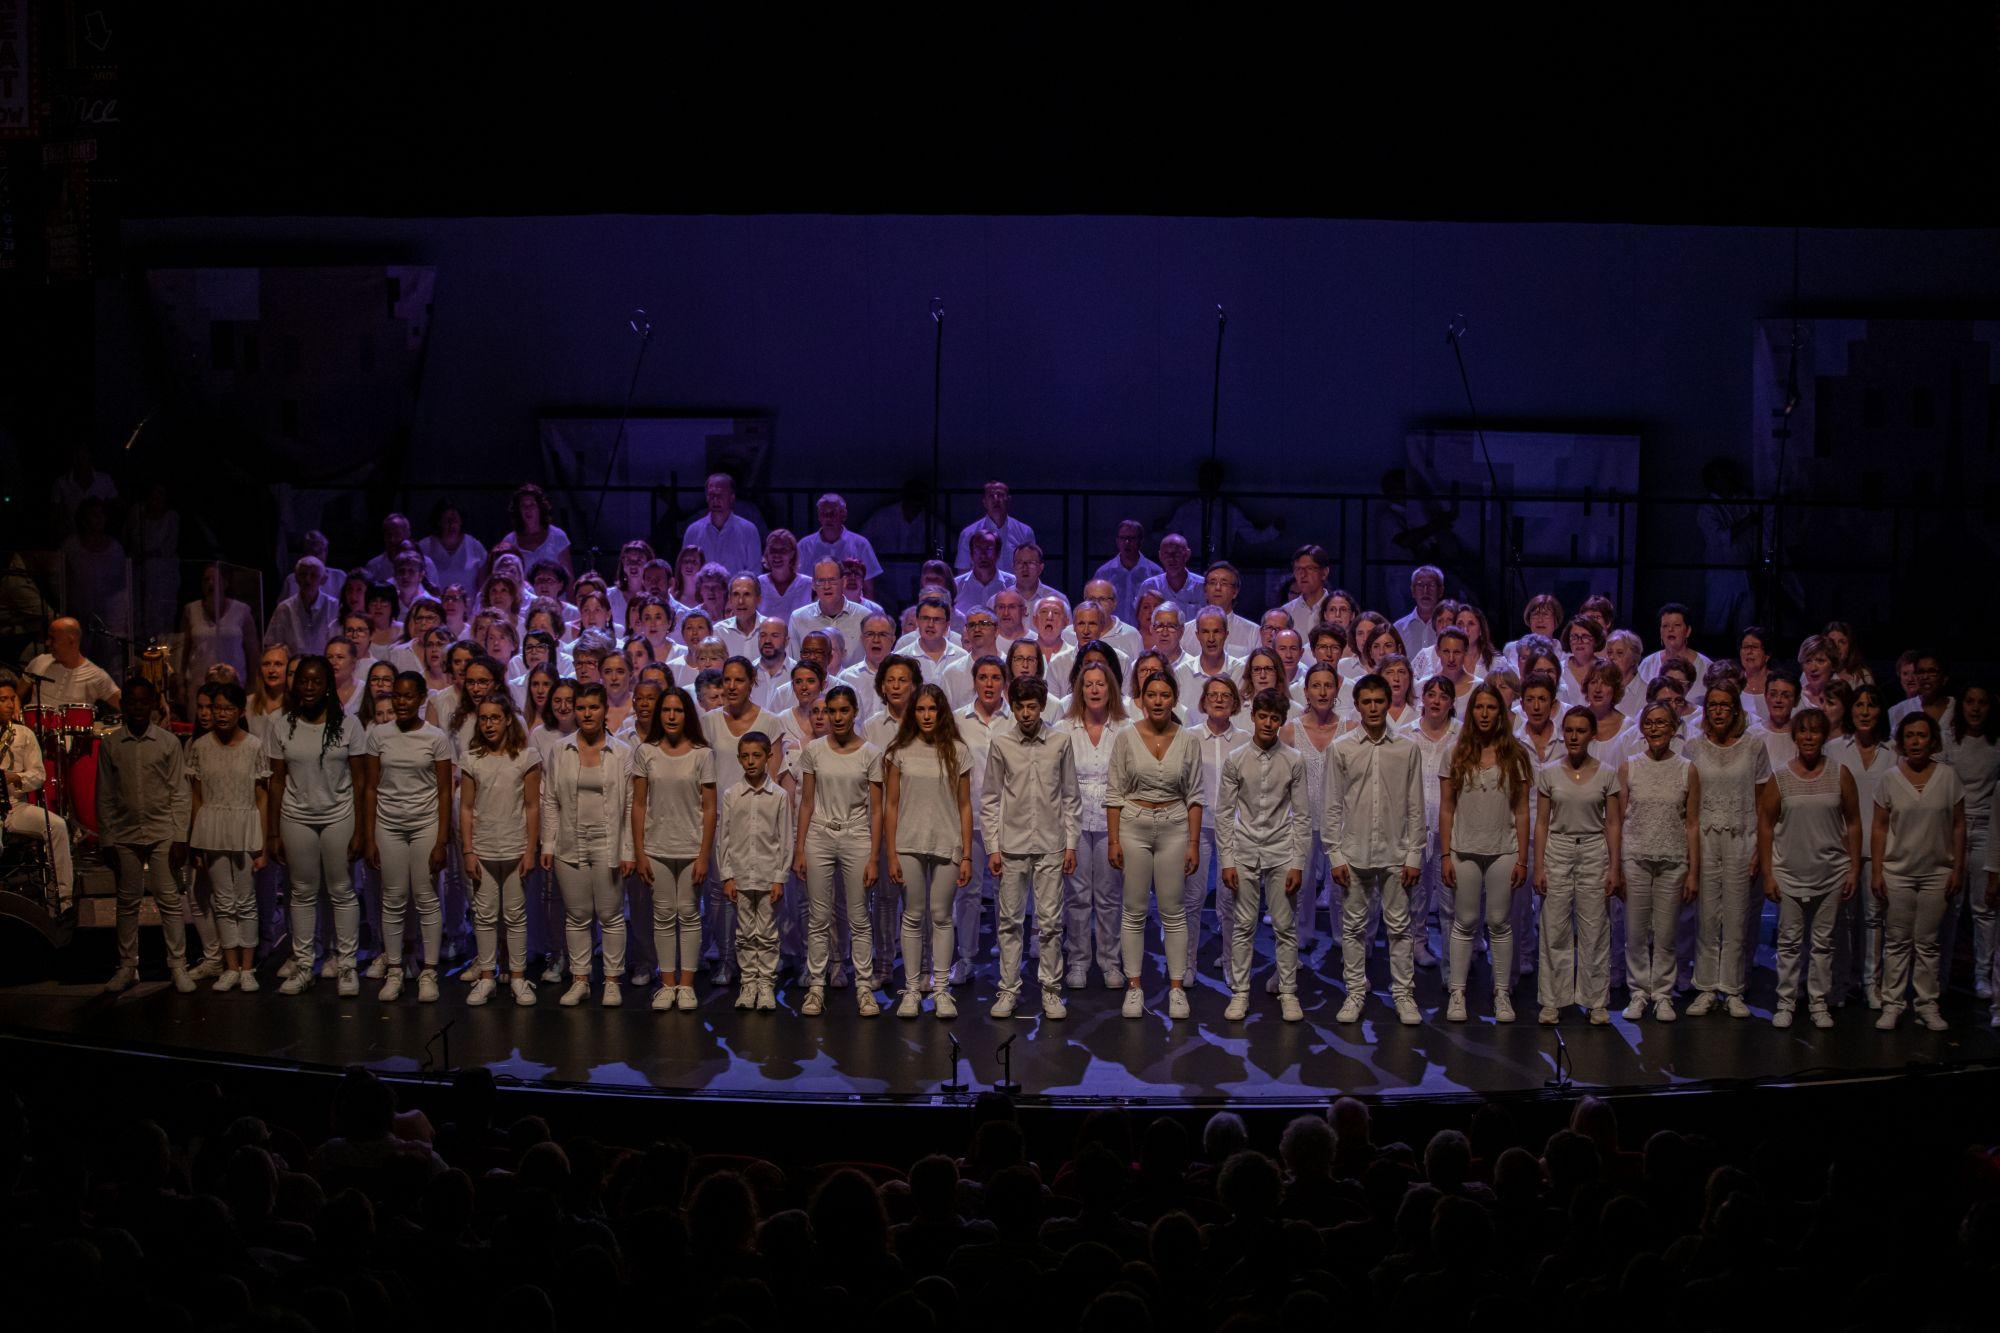 concertbroadway-534